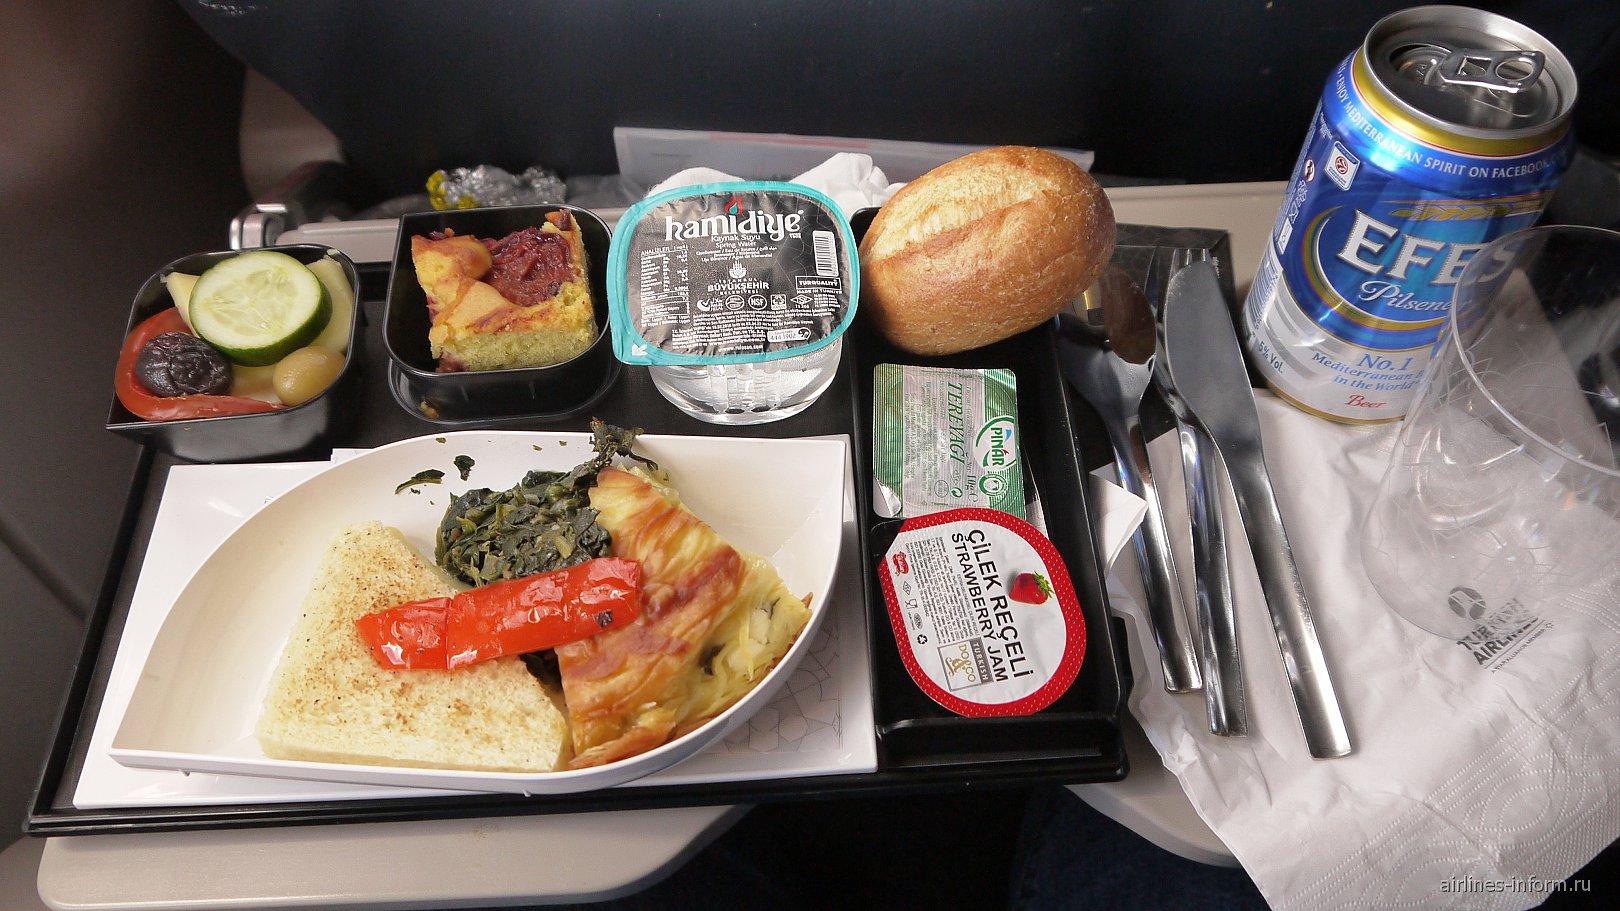 Бортпитание на рейсе Турецких авиалиний Екатеринбург-Стамбул